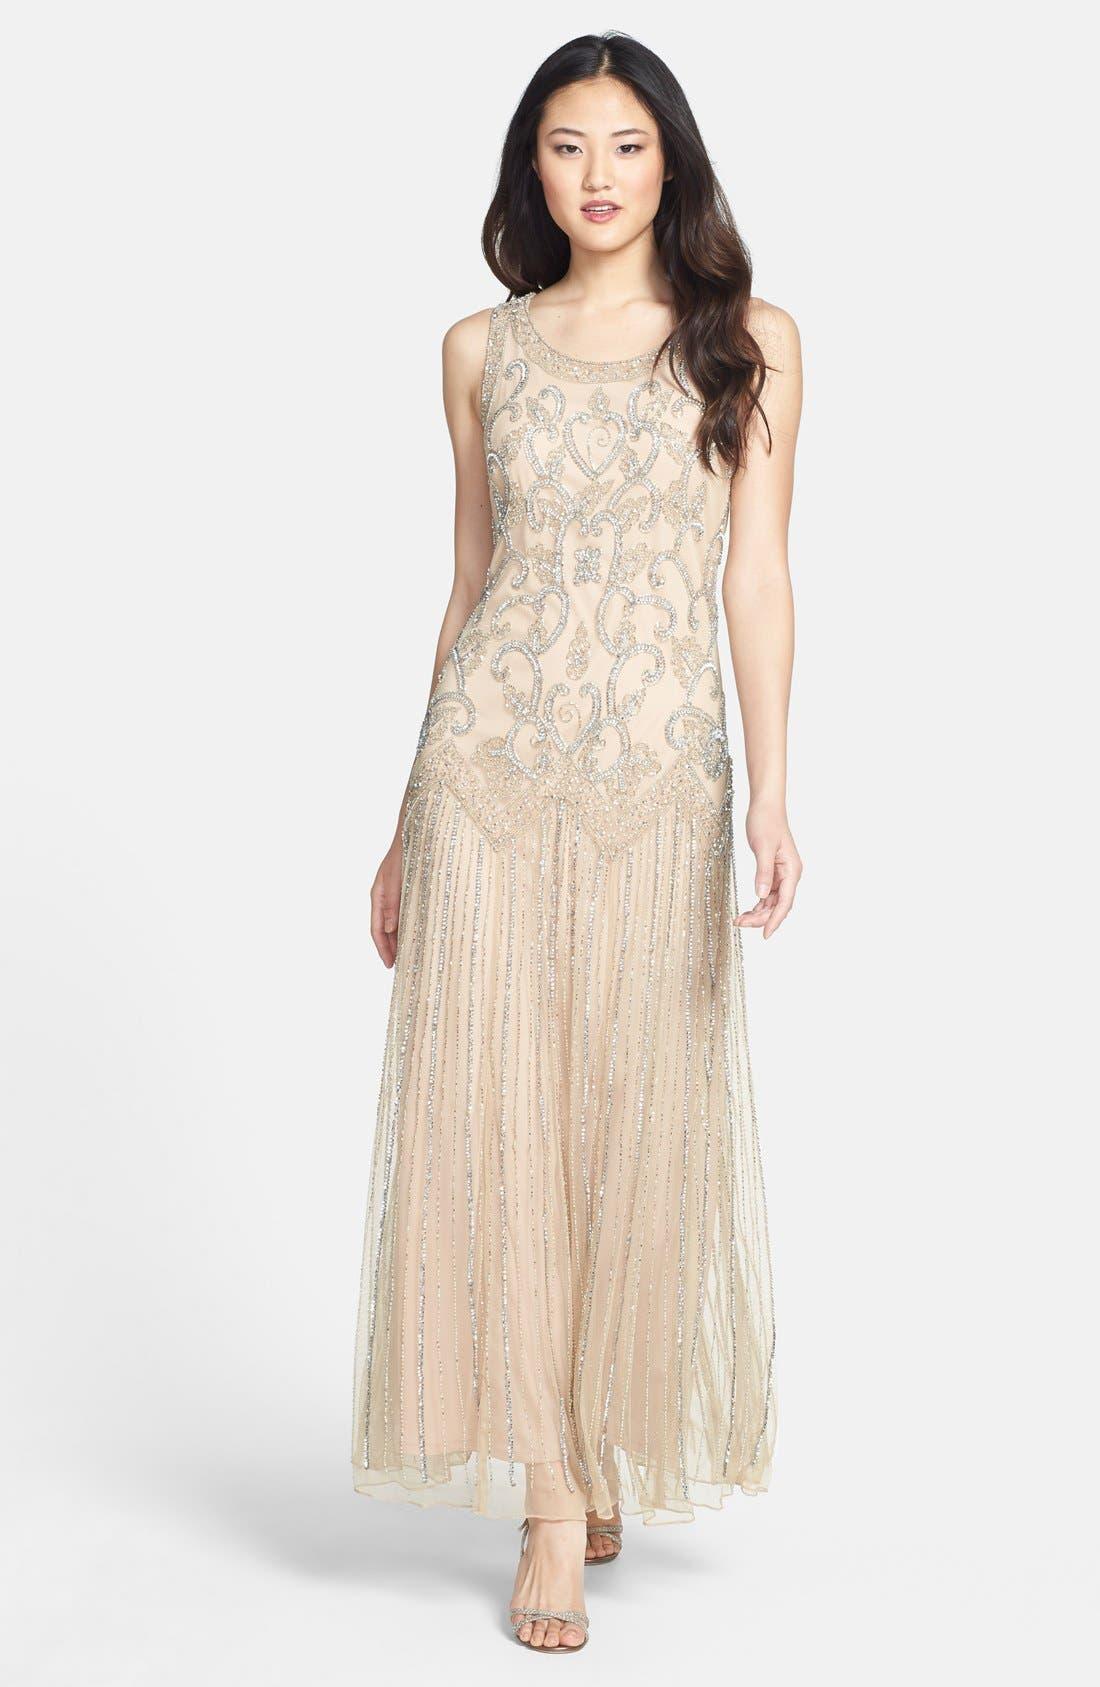 Alternate Image 1 Selected - Pisarro Nights Embellished Mesh Dress (Regular & Petite)